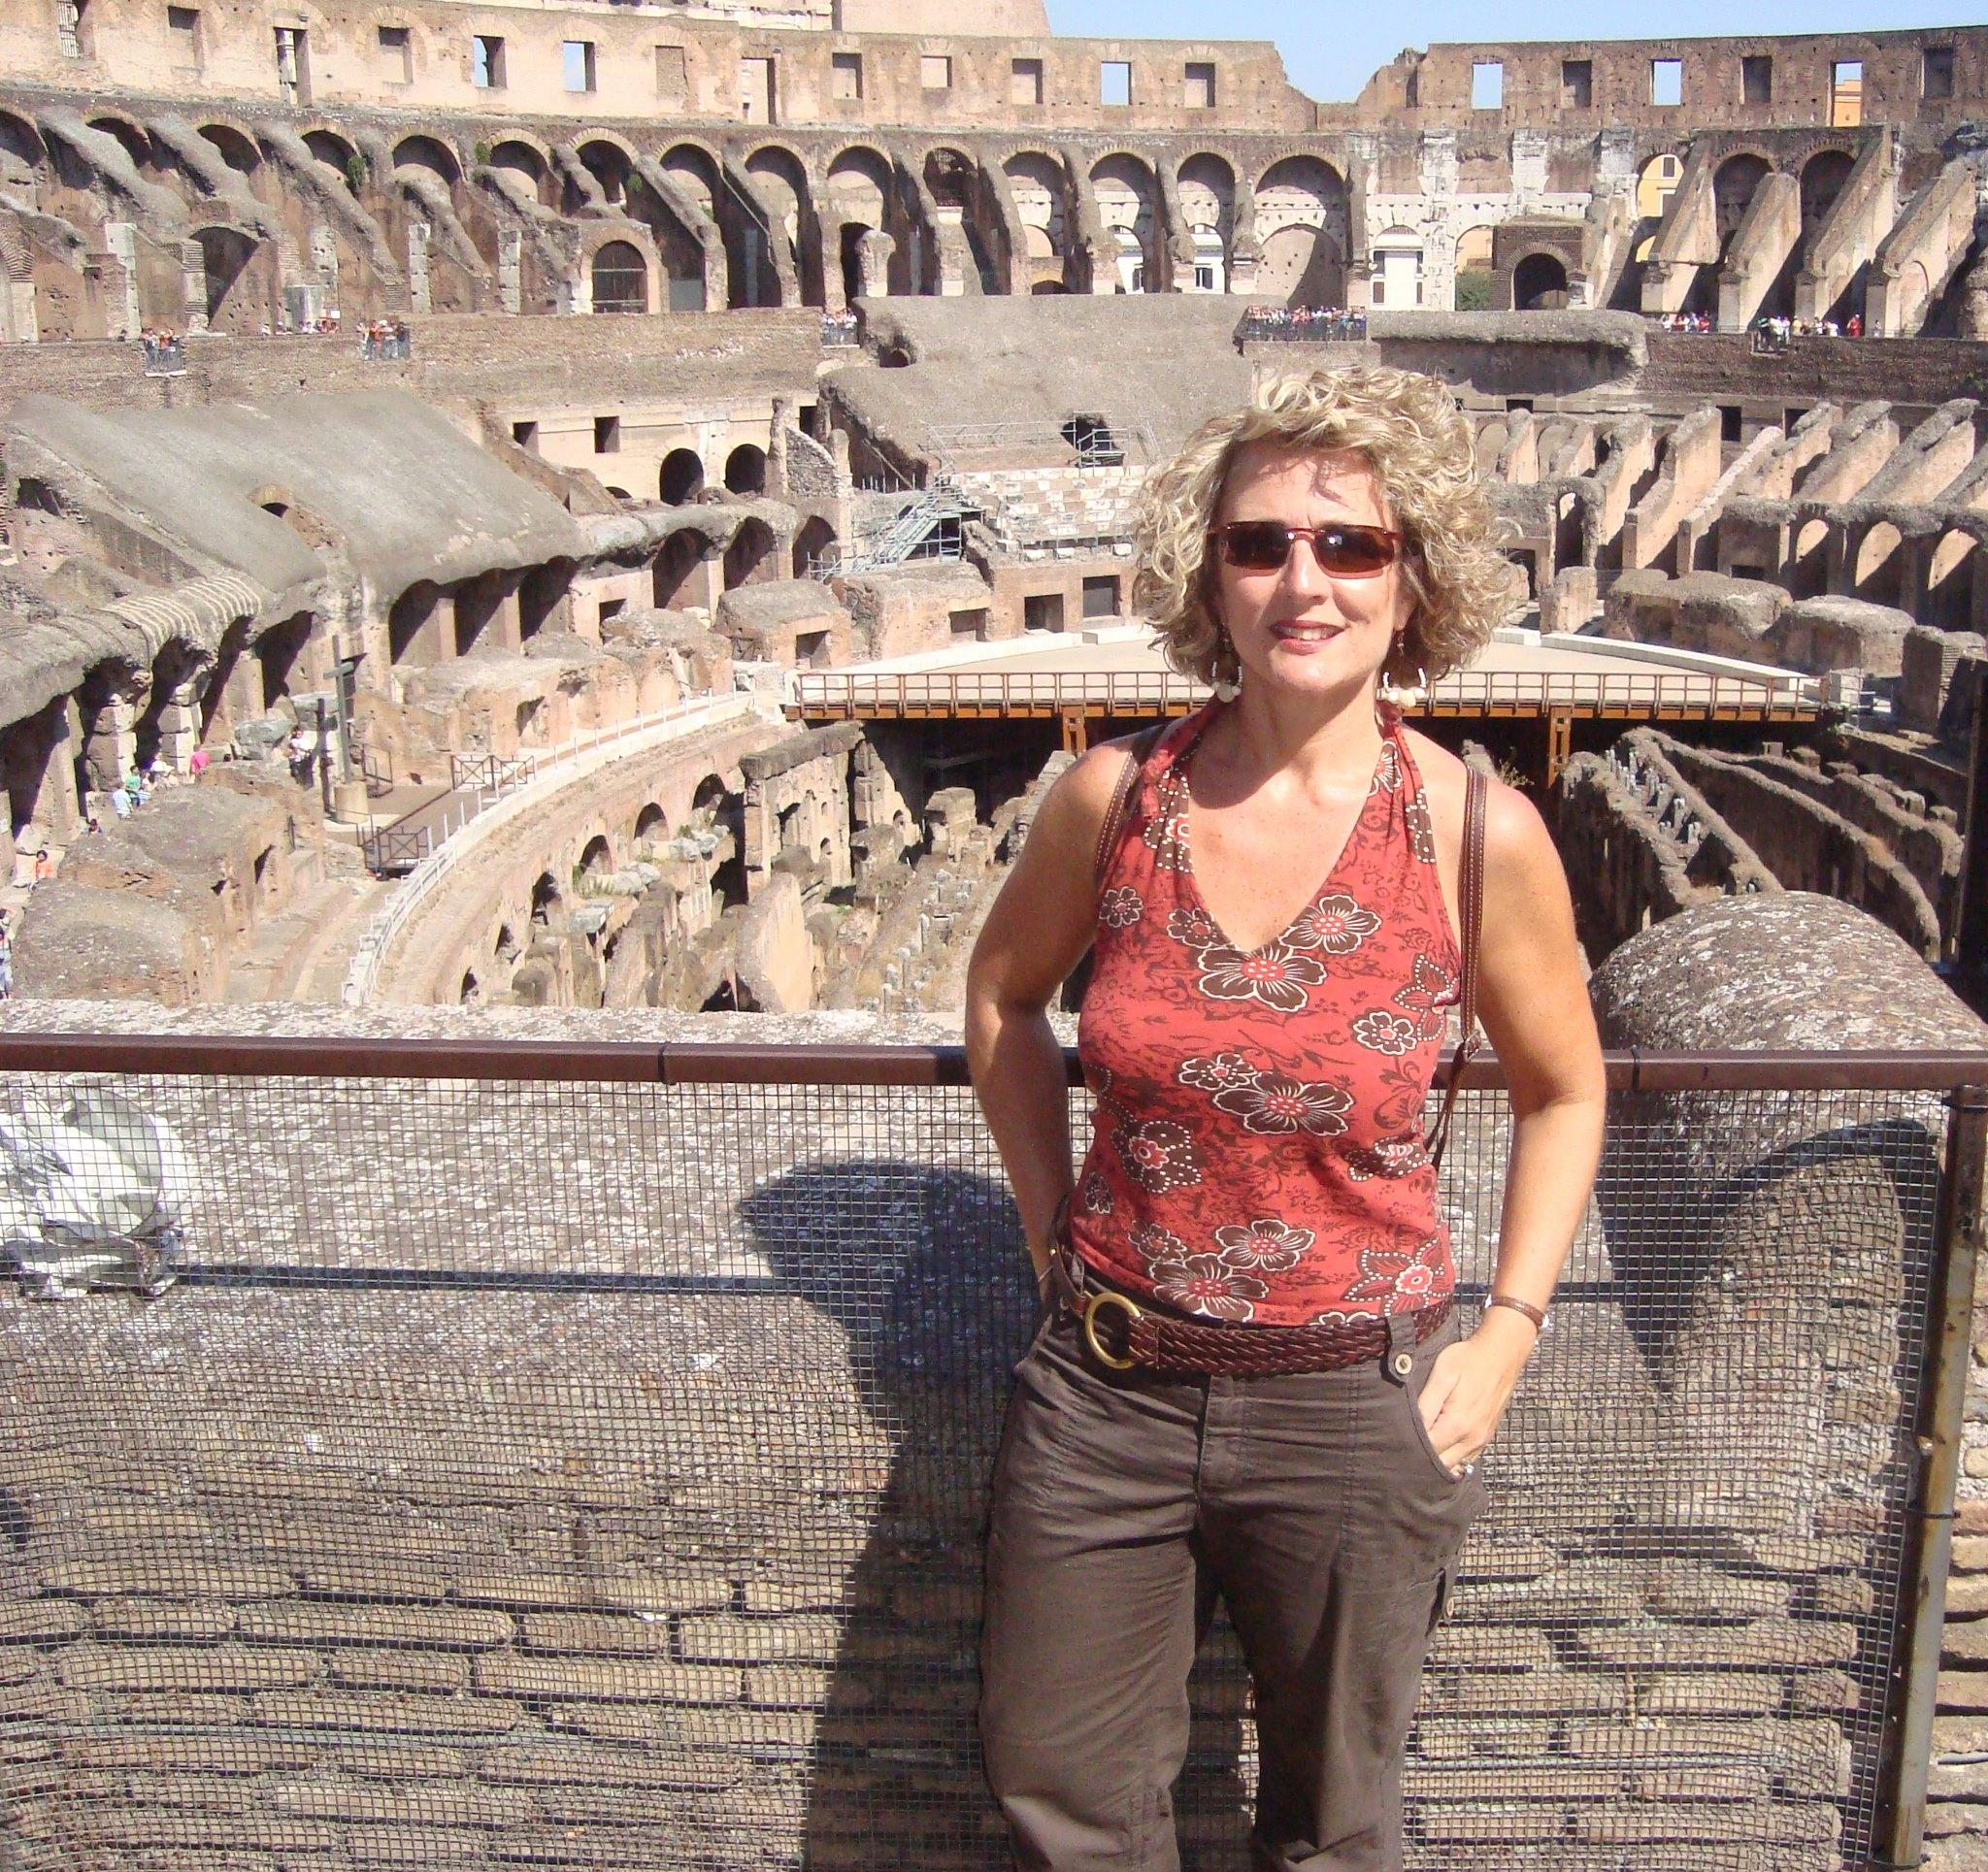 Jenny at the Roman Colosseum